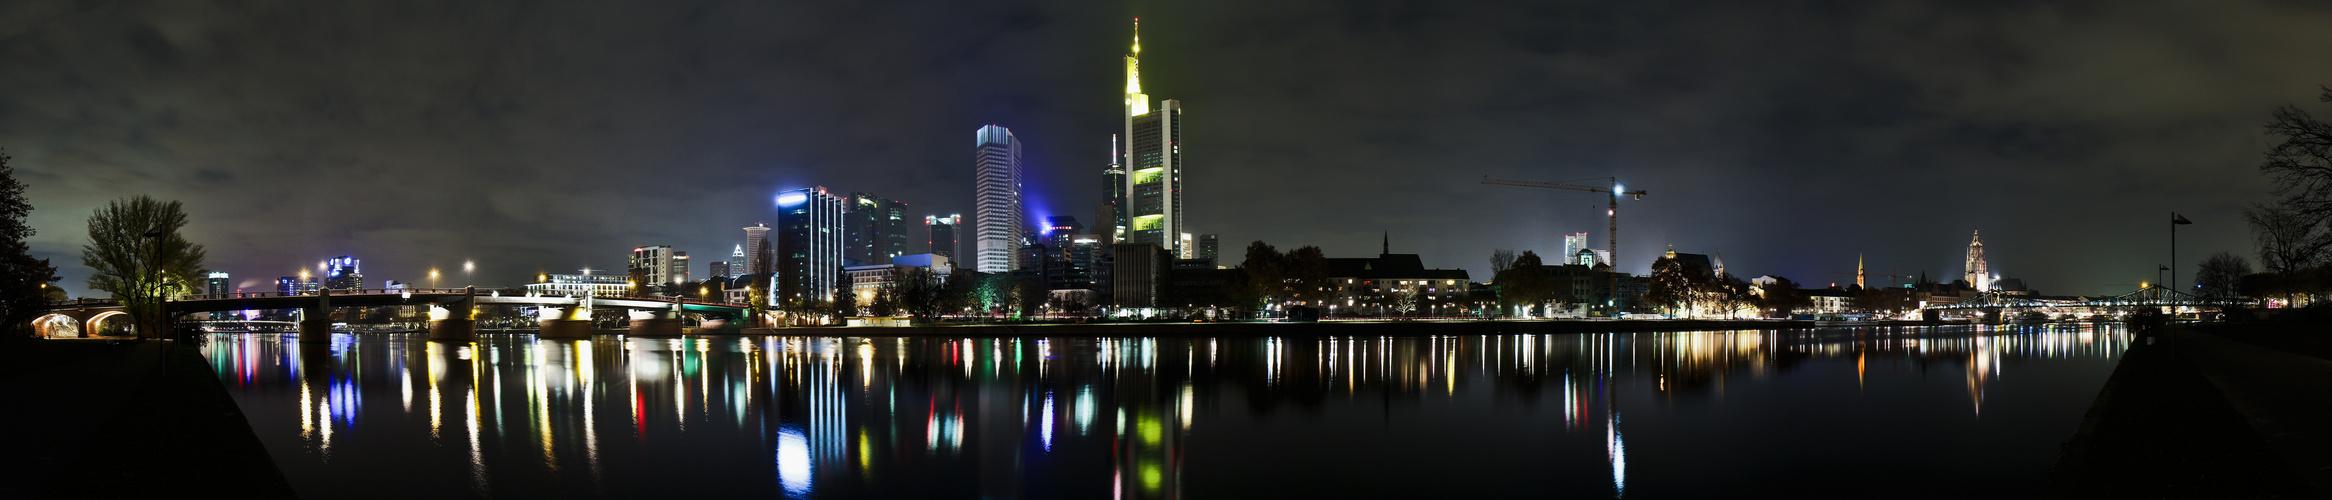 Frankfurt Nacht Pano1